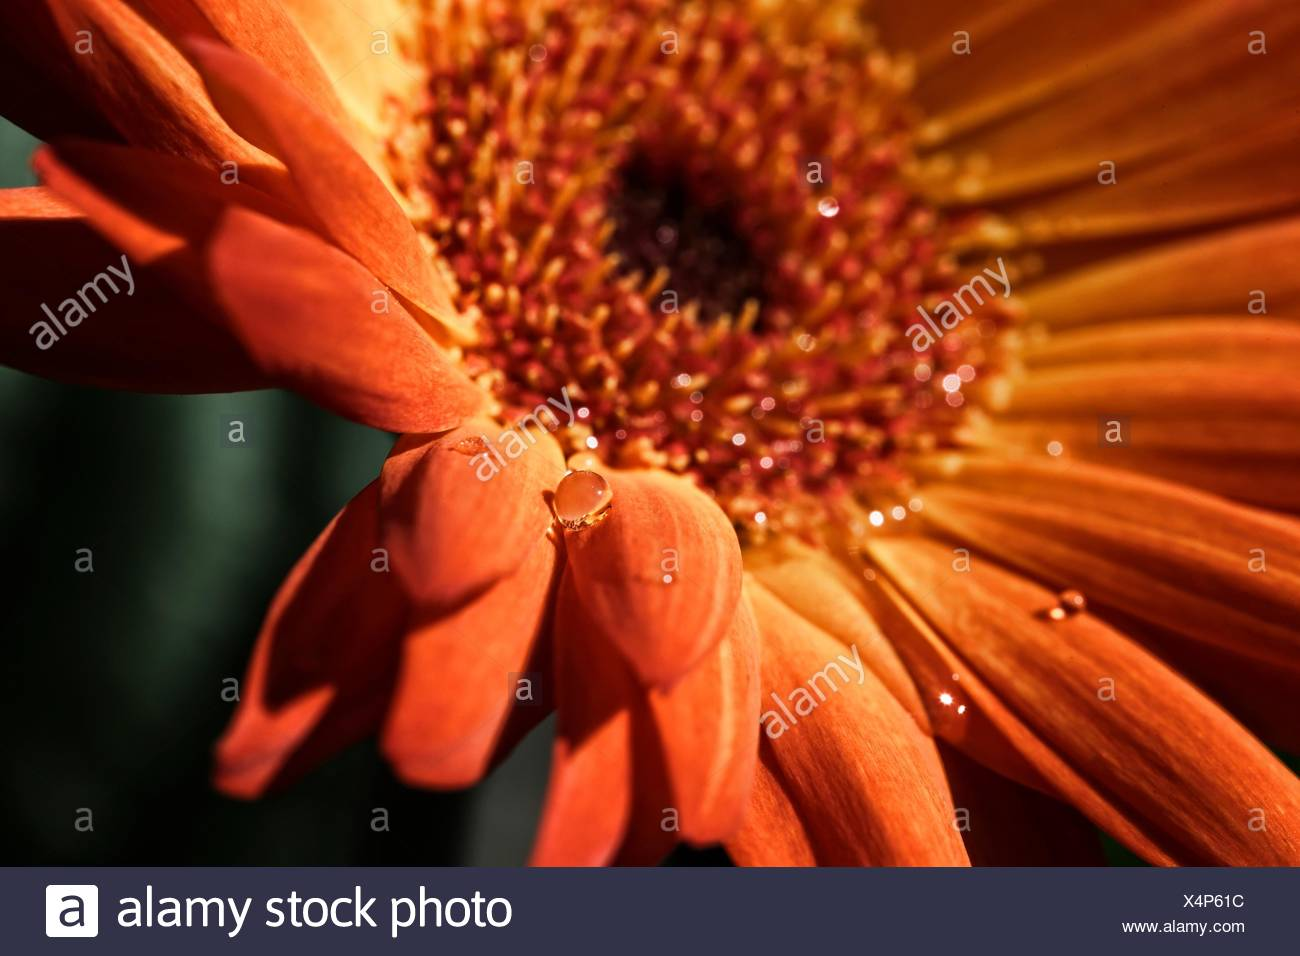 Con gotas de agua de flor de naranja Imagen De Stock